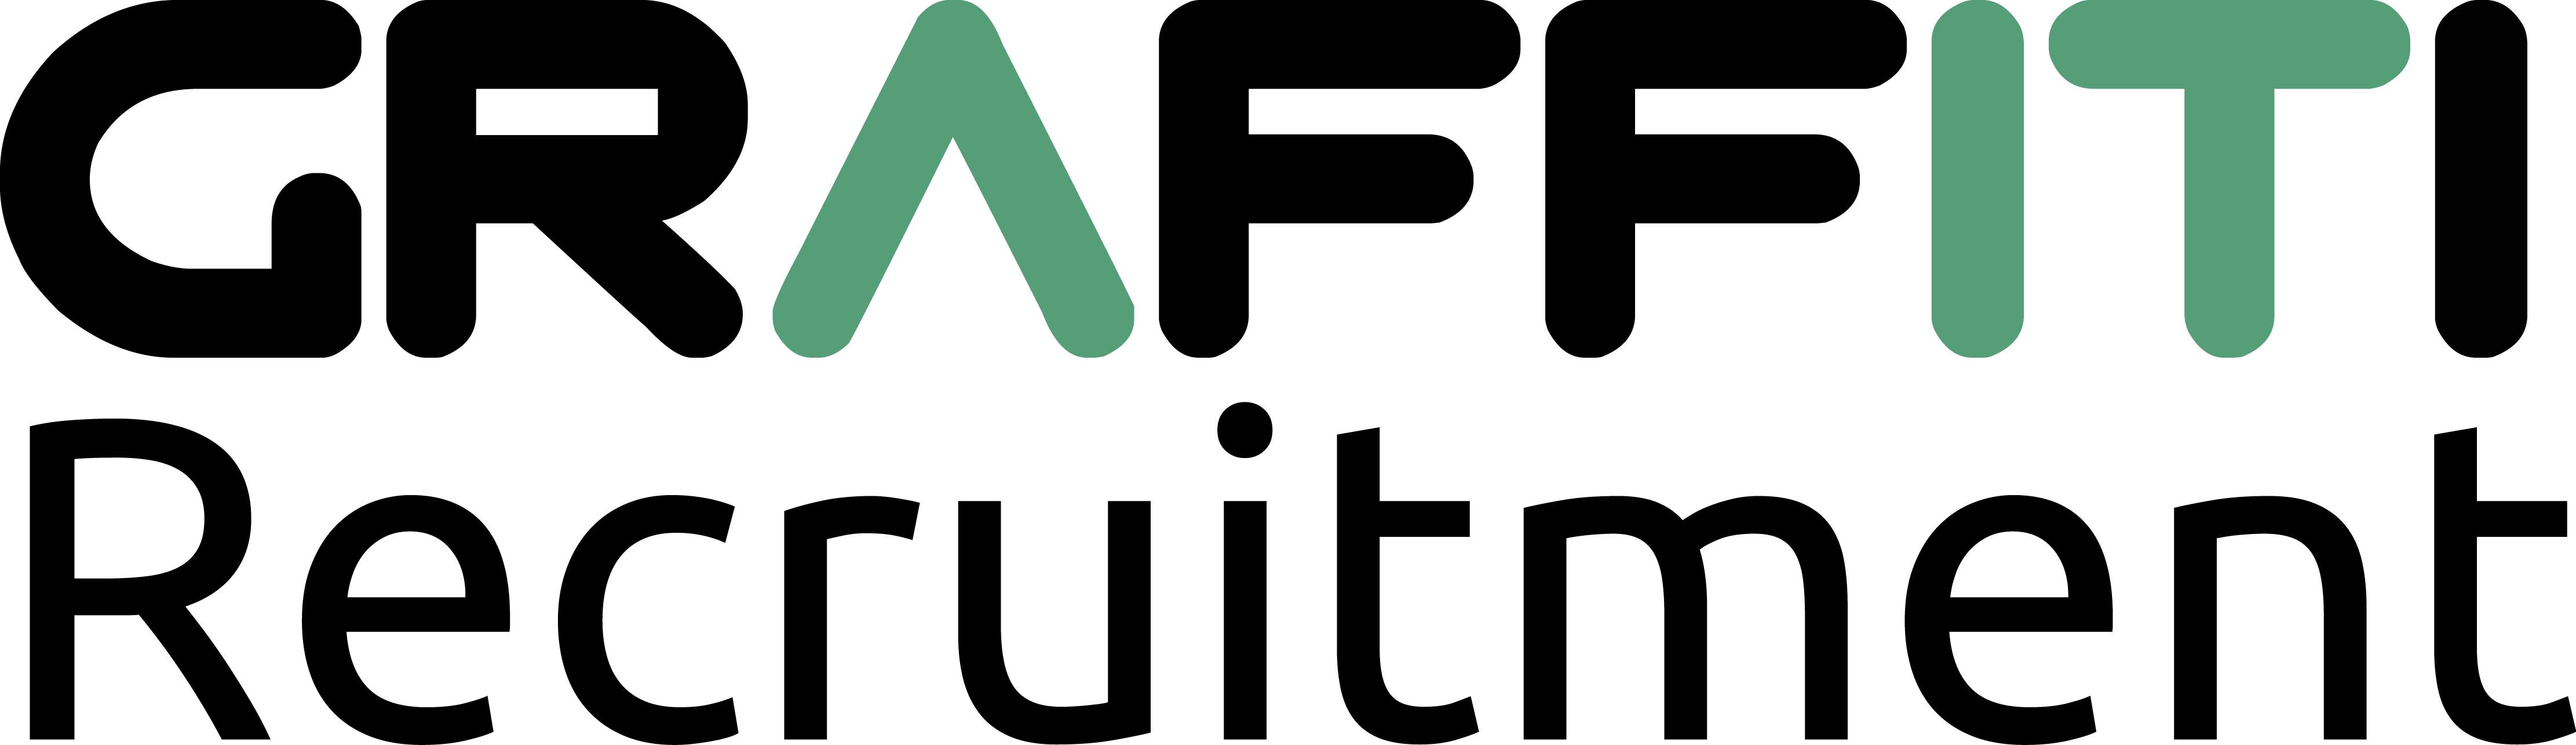 logo for Graffiti Recruitment